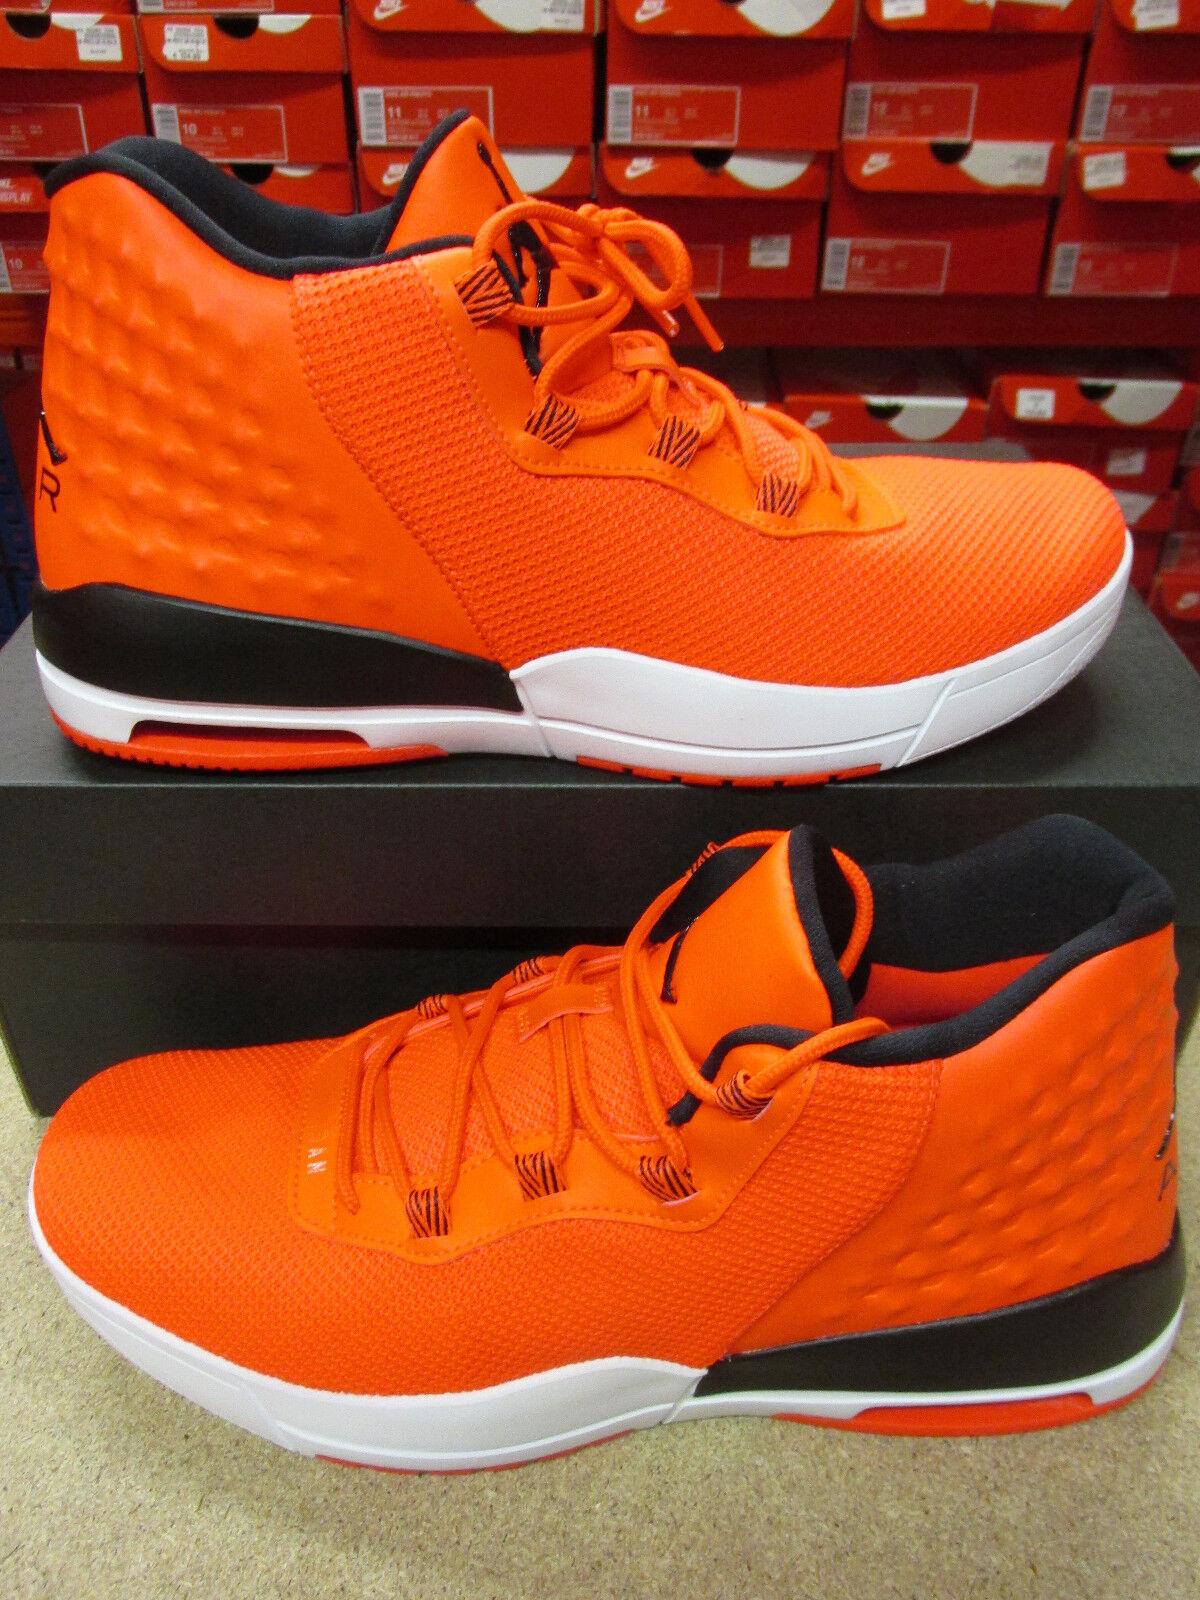 Nike Air Jordan Academy Mens Hi Top Trainers 844515 605 Sneakers shoes